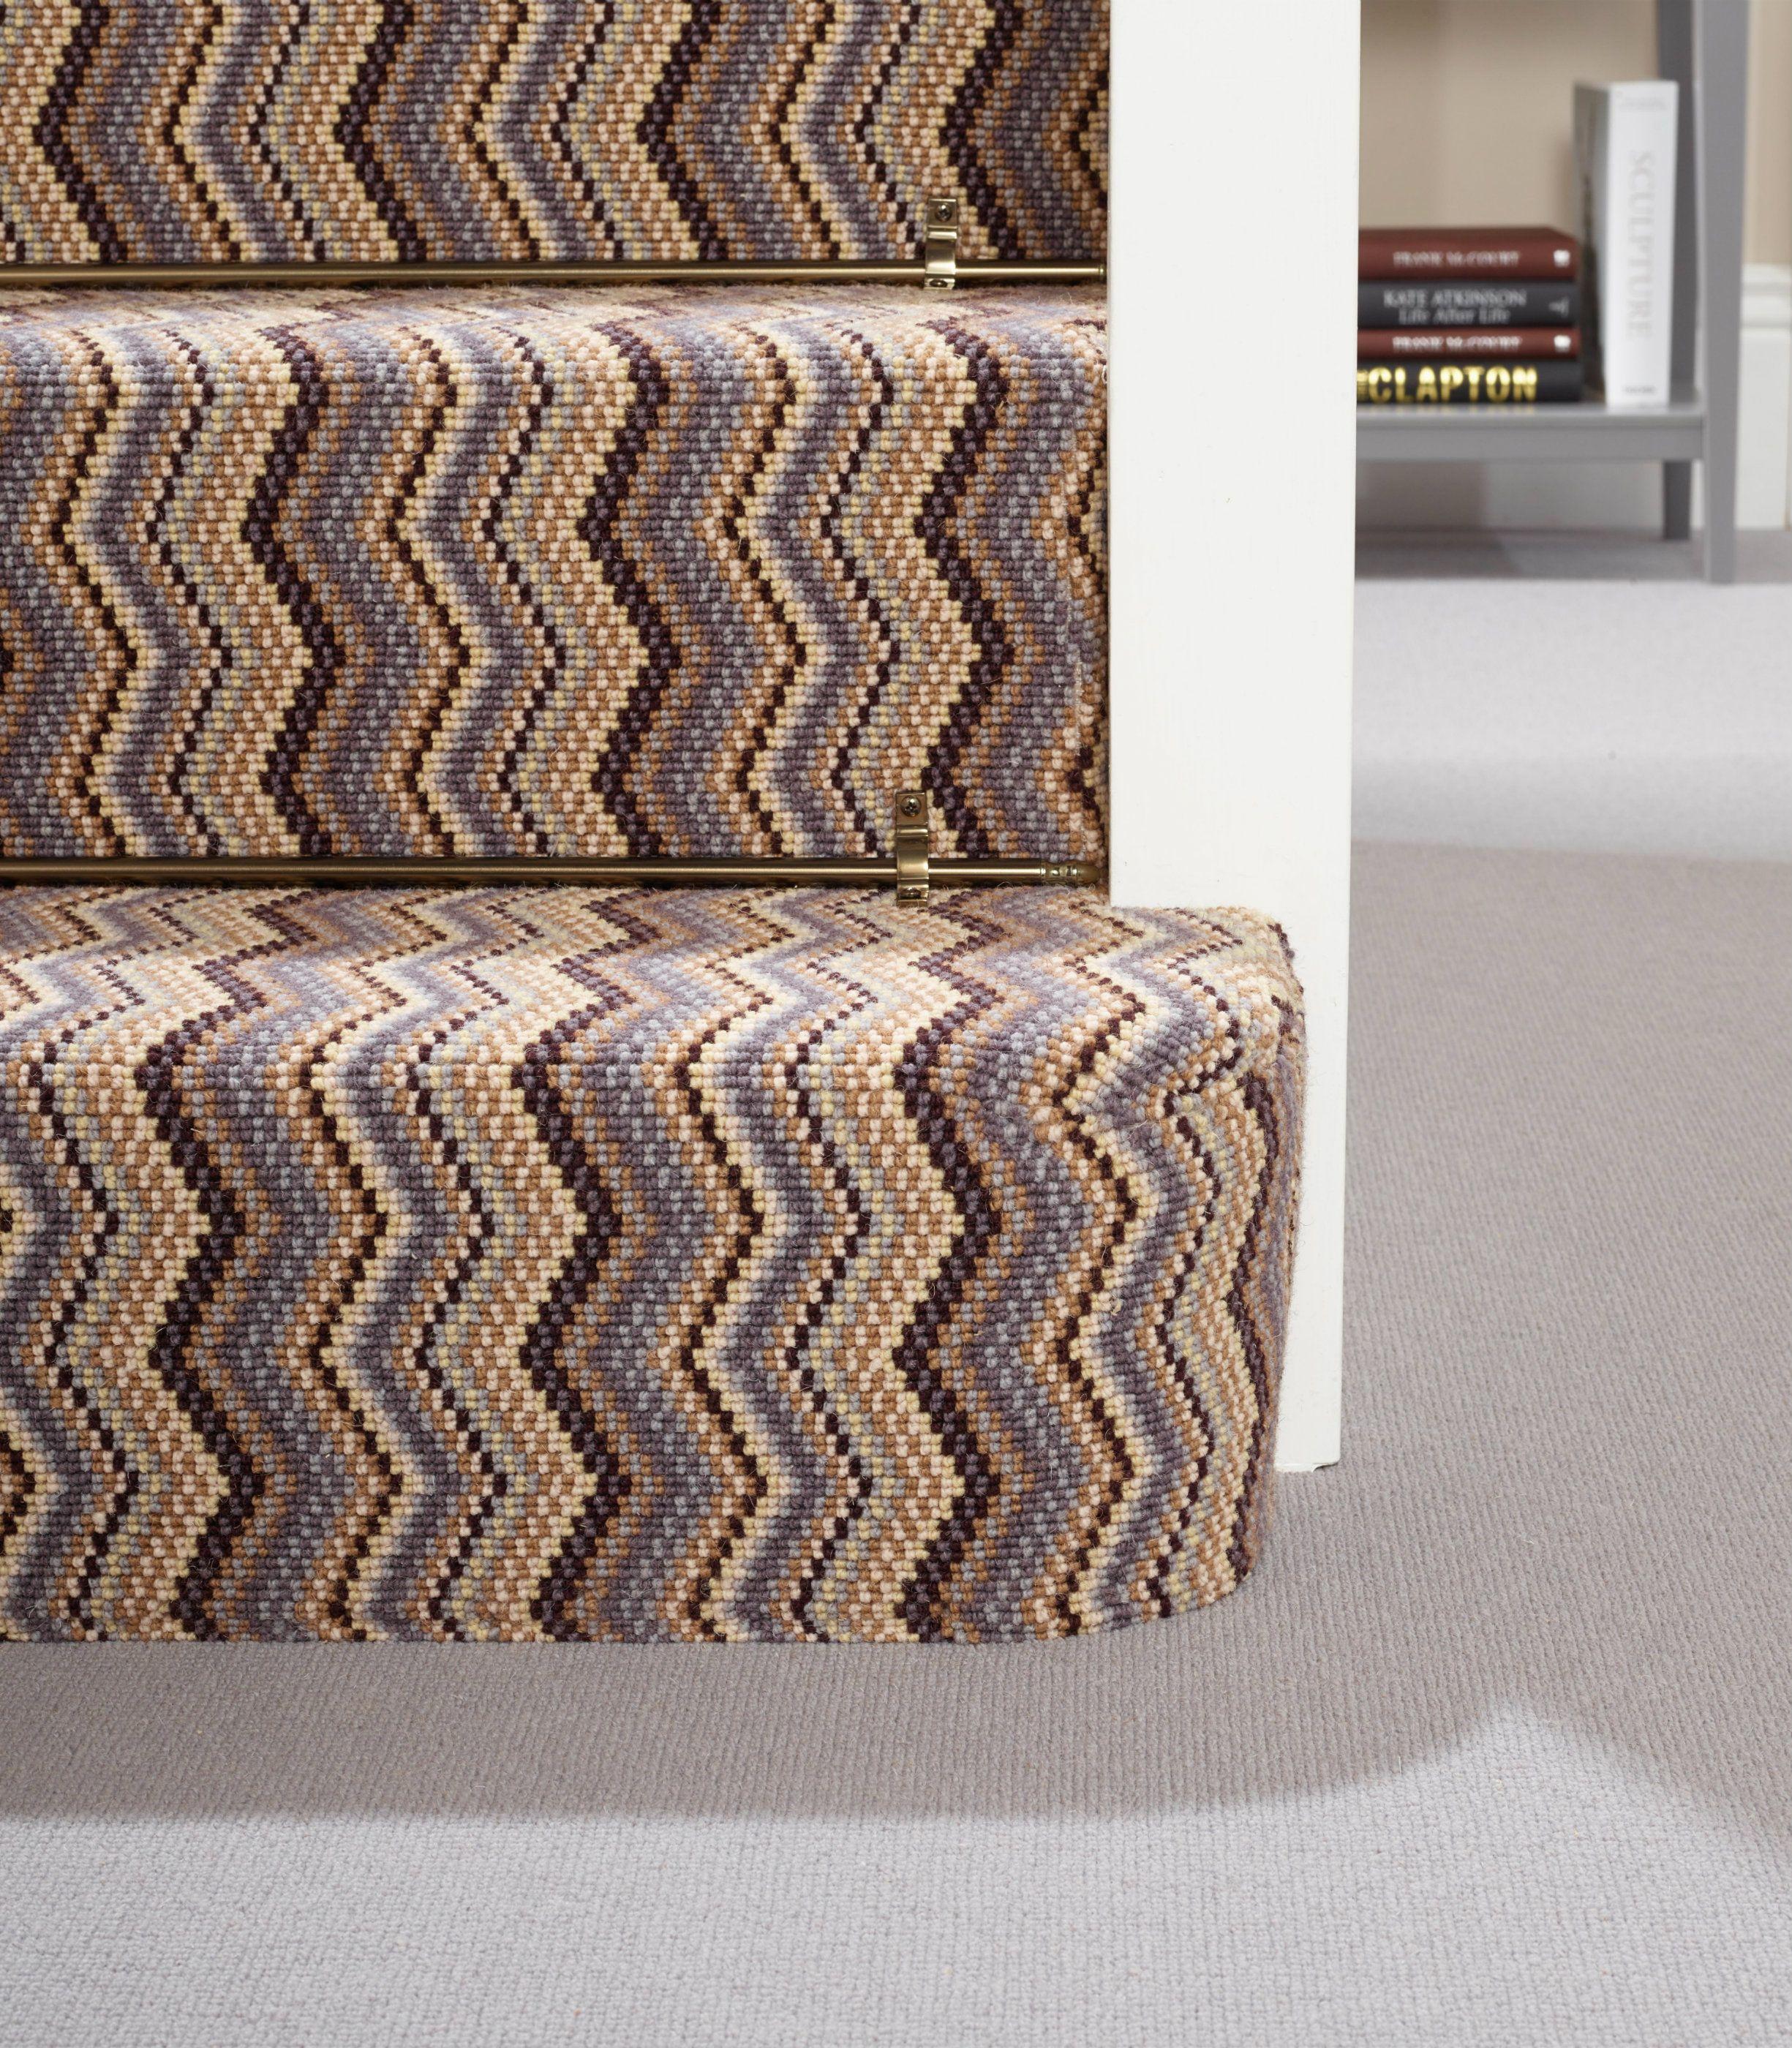 Best Deco Carpet Flooring Zigzag Design Stairs Staircase 640 x 480